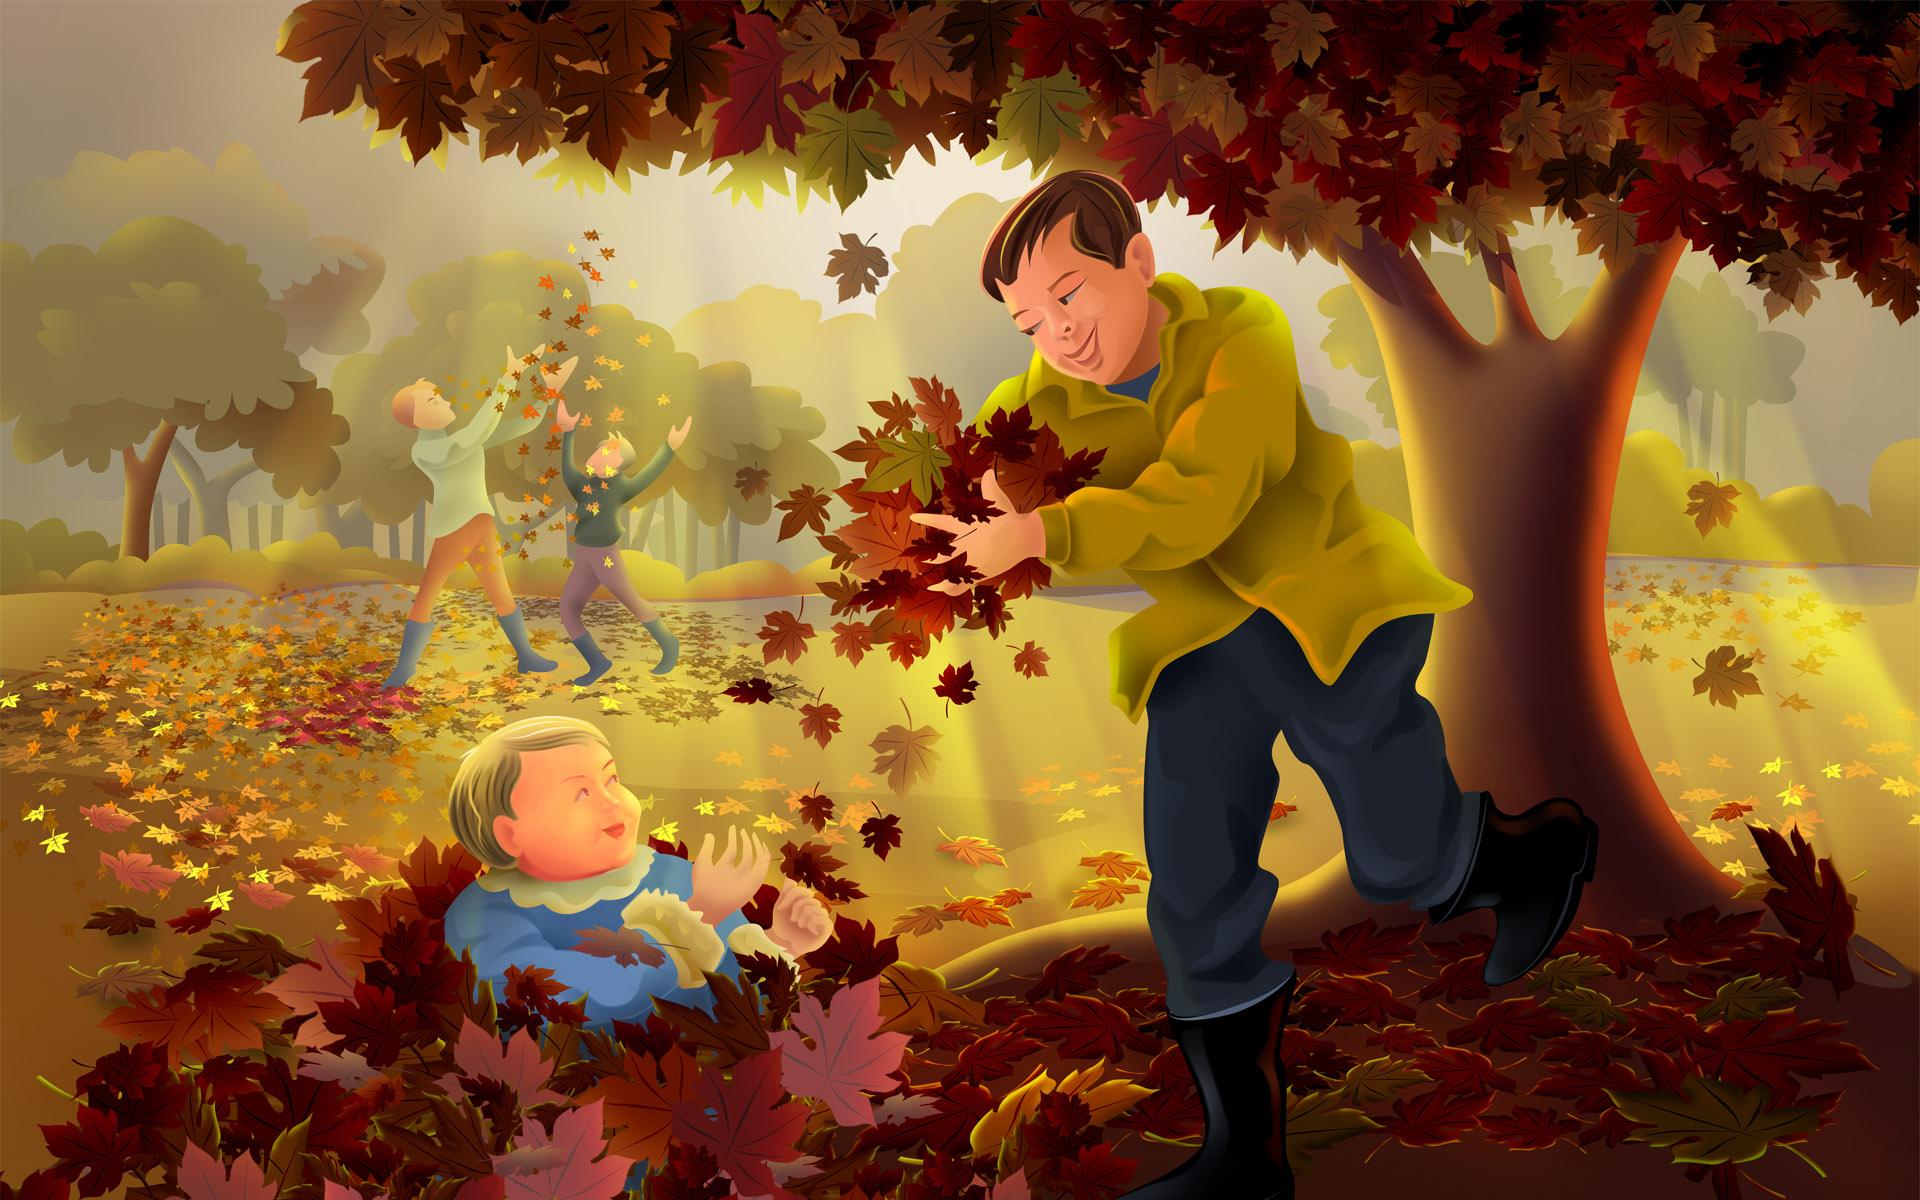 Disney Cartoon Hd Wallpapers For Desktop